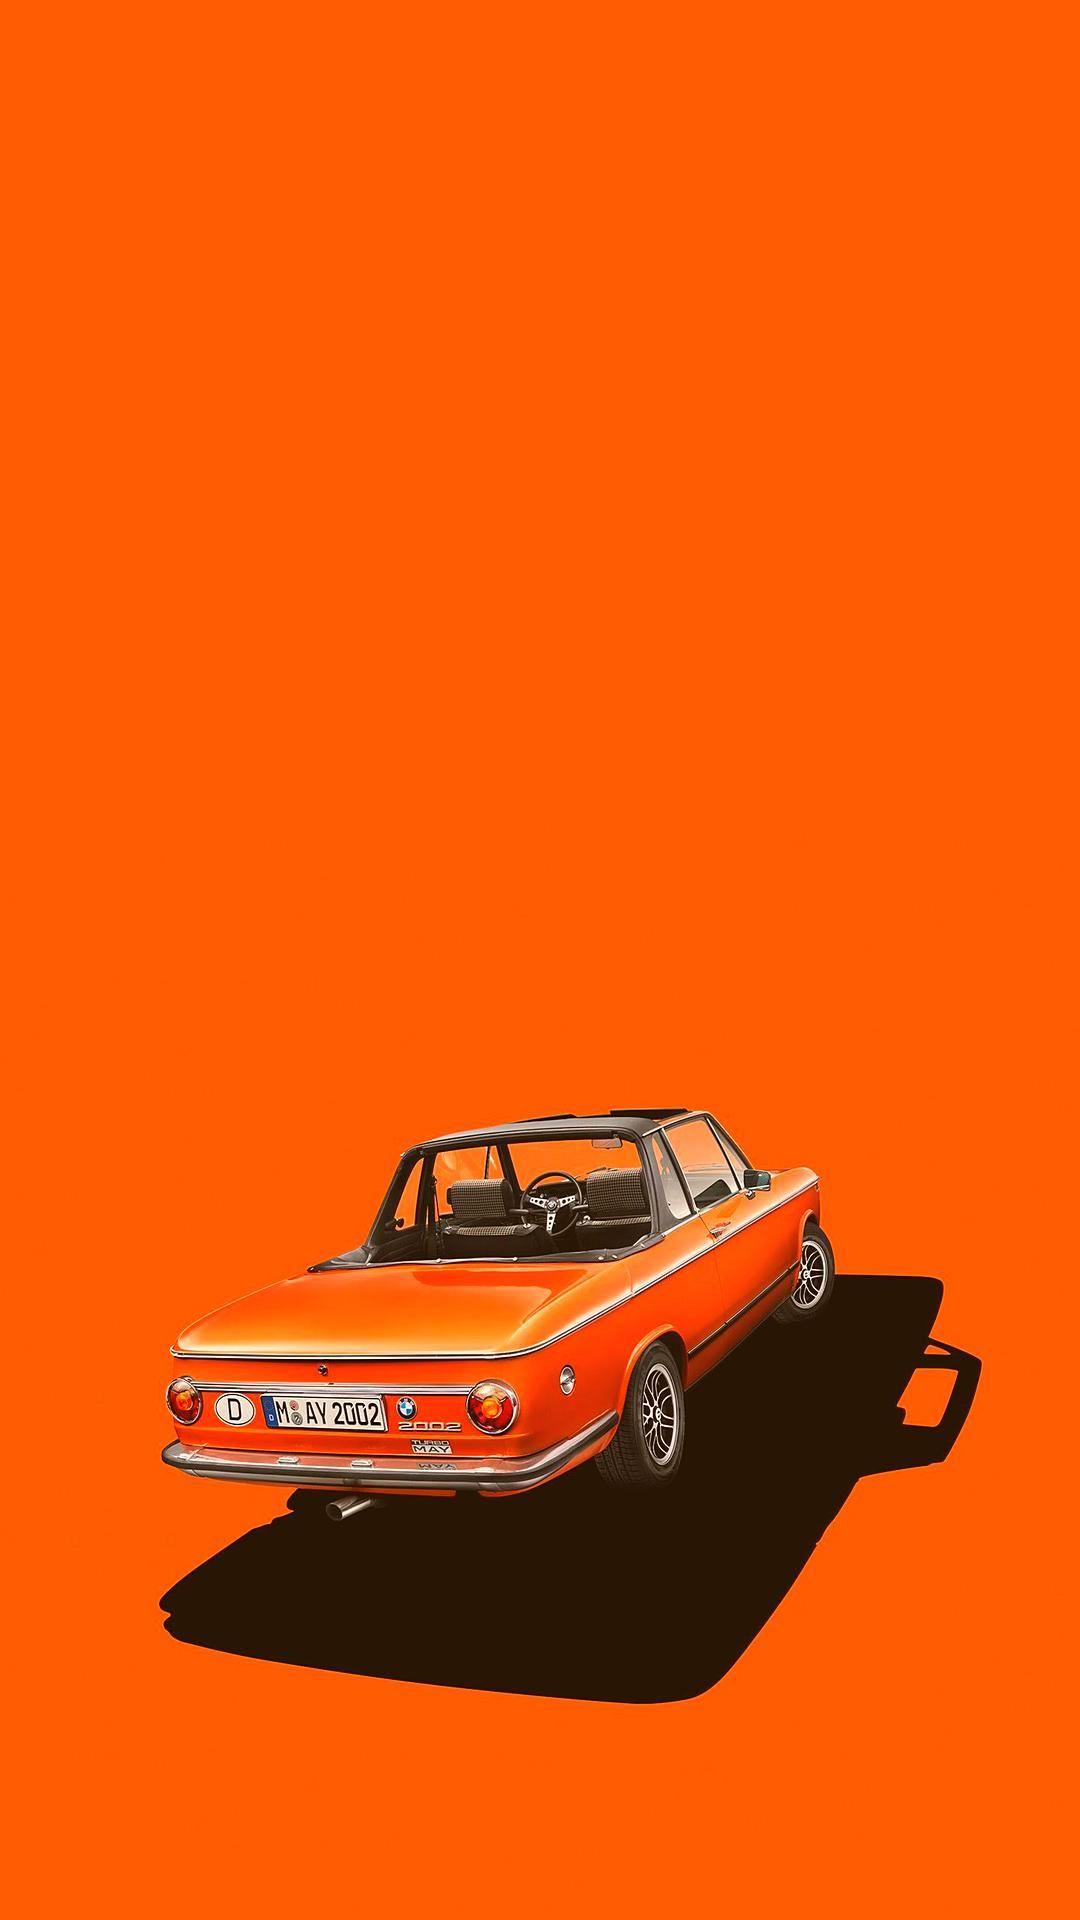 Classic Car Minimal Wallpaper 1080x1920 Automotive Artwork Iphone Minimalist Wallpaper Car Iphone Wallpaper